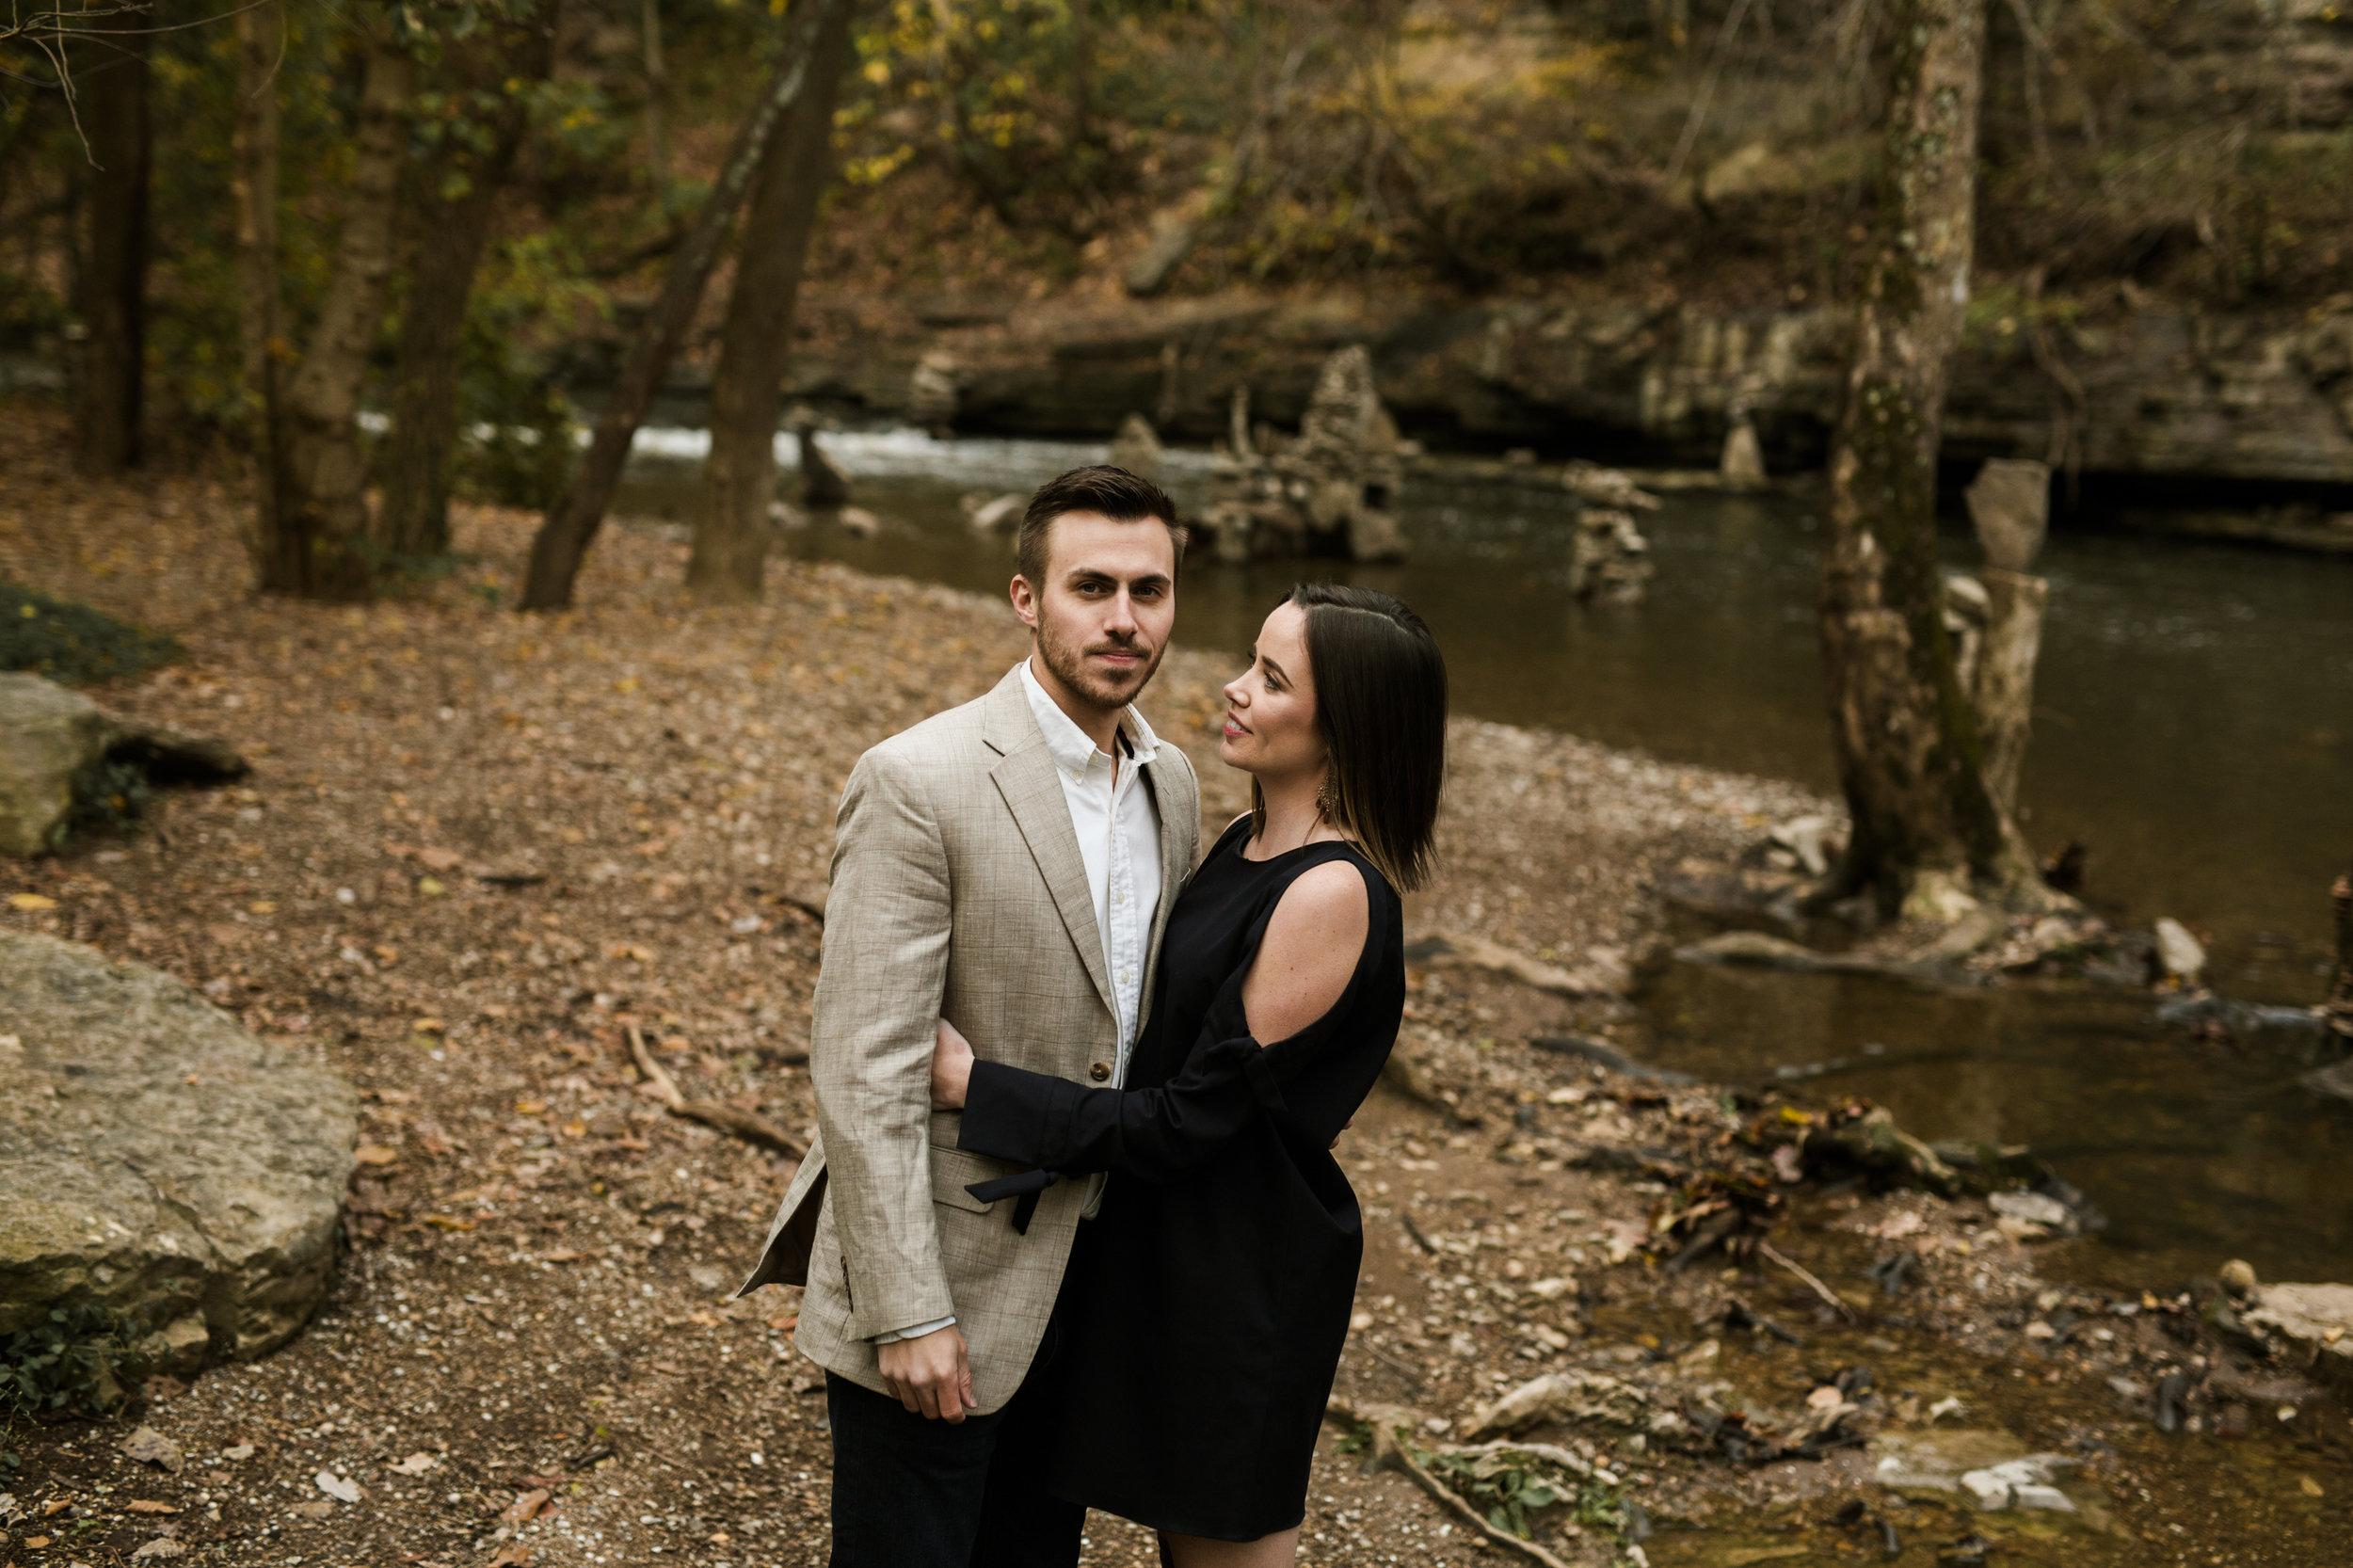 Kelsey and Daniel Engagement 2018 Crystal Ludwick Photo Louisville Wedding Photographer Kentucky Wedding Photographer (17 of 31).jpg